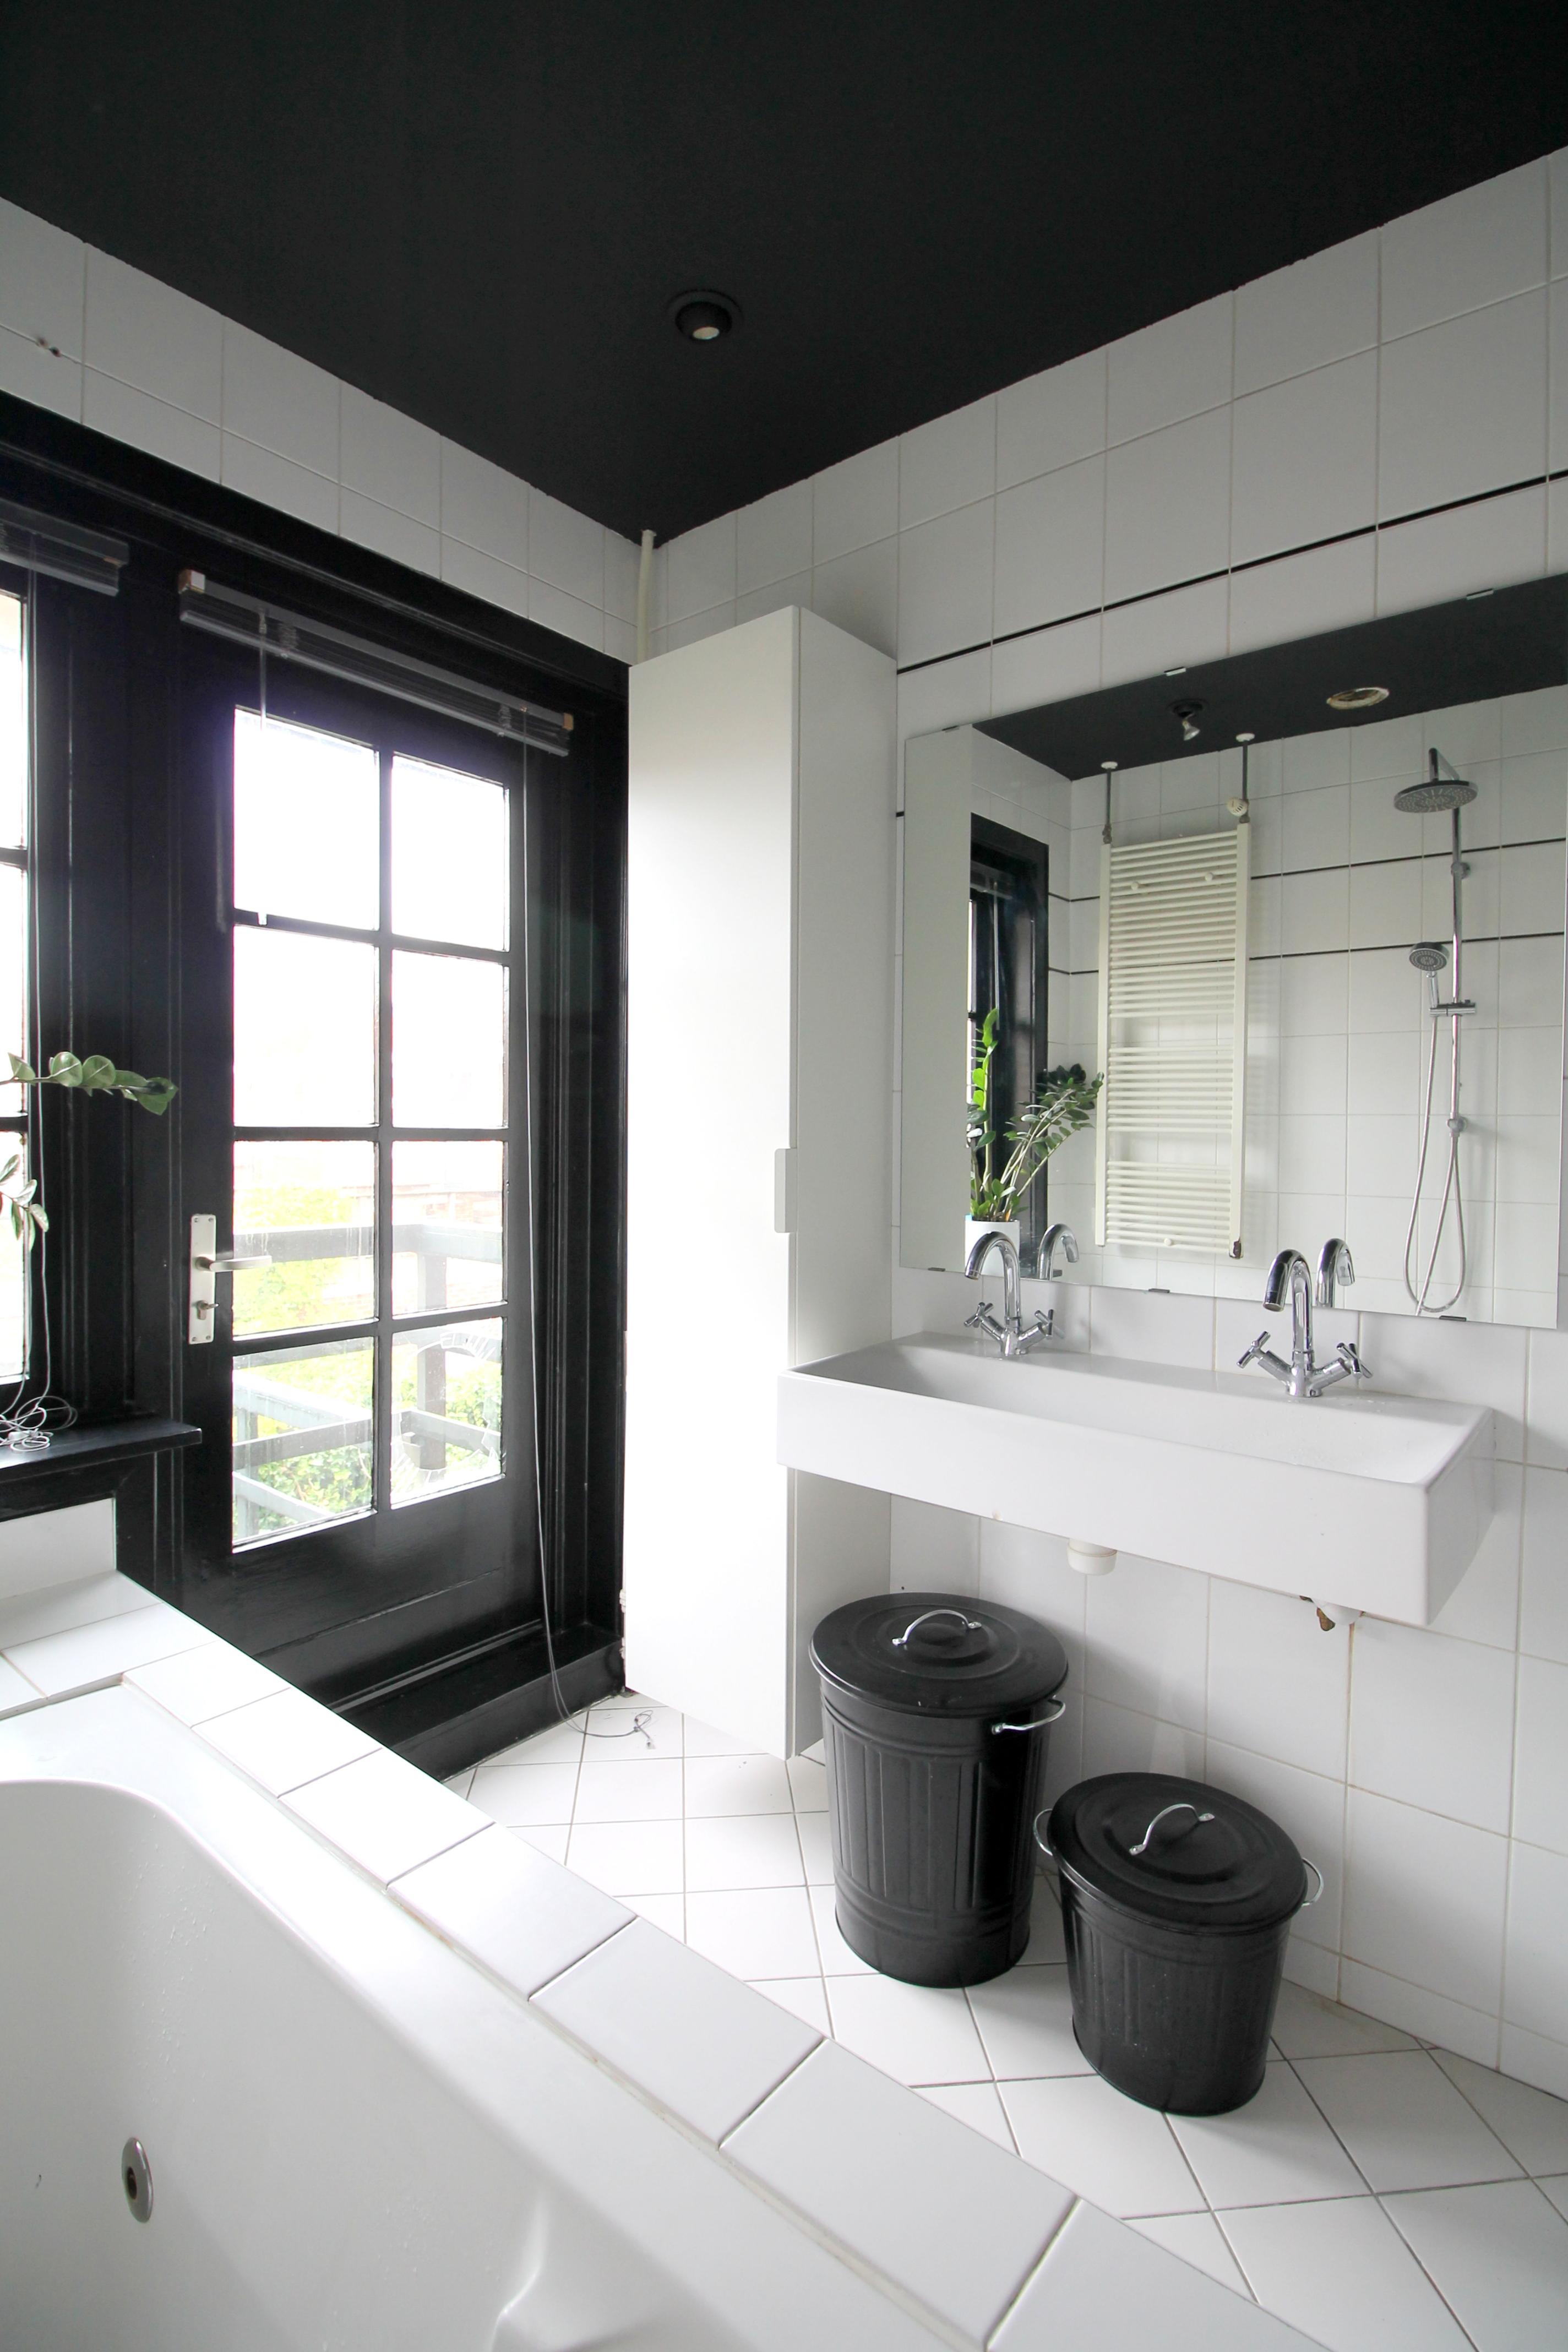 Renovating Pt 15 Black Ceiling Bathroom Donebymyself